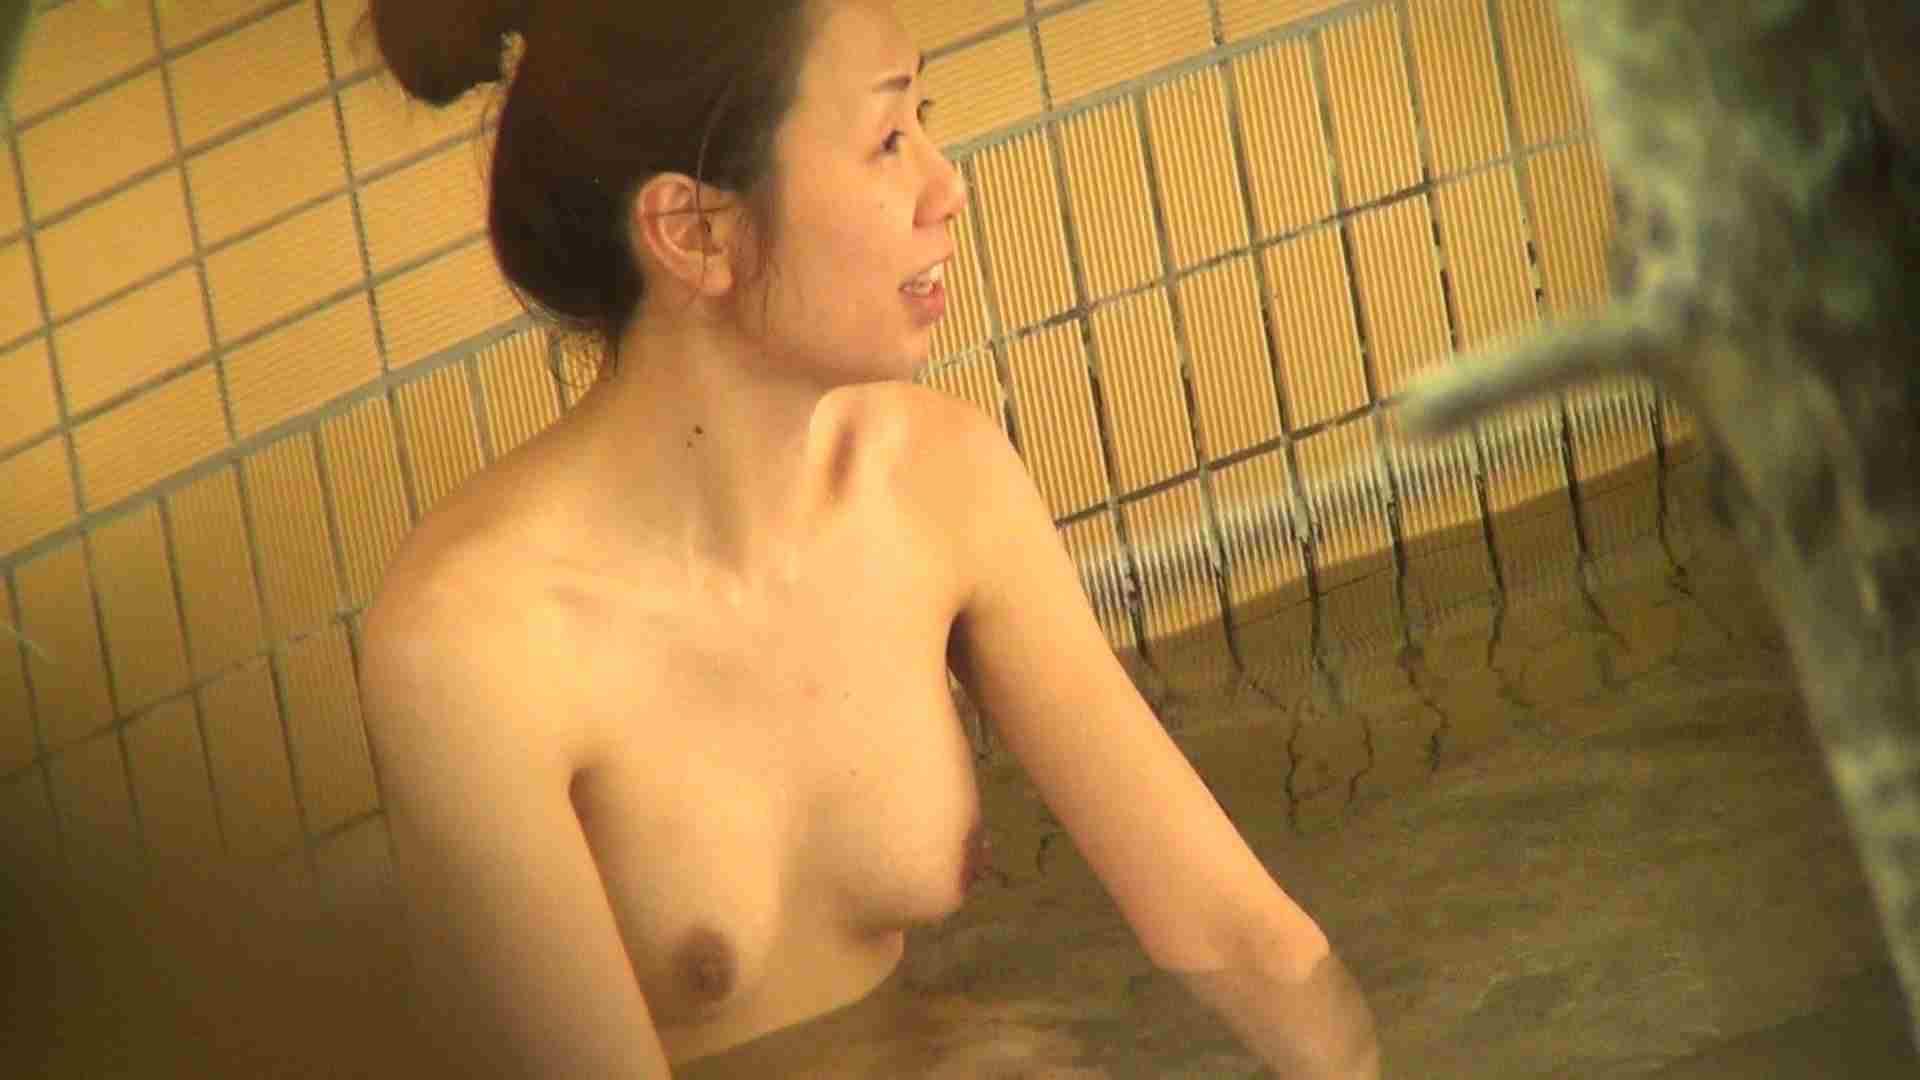 Aquaな露天風呂Vol.312 露天風呂突入 盗撮動画紹介 92pic 20